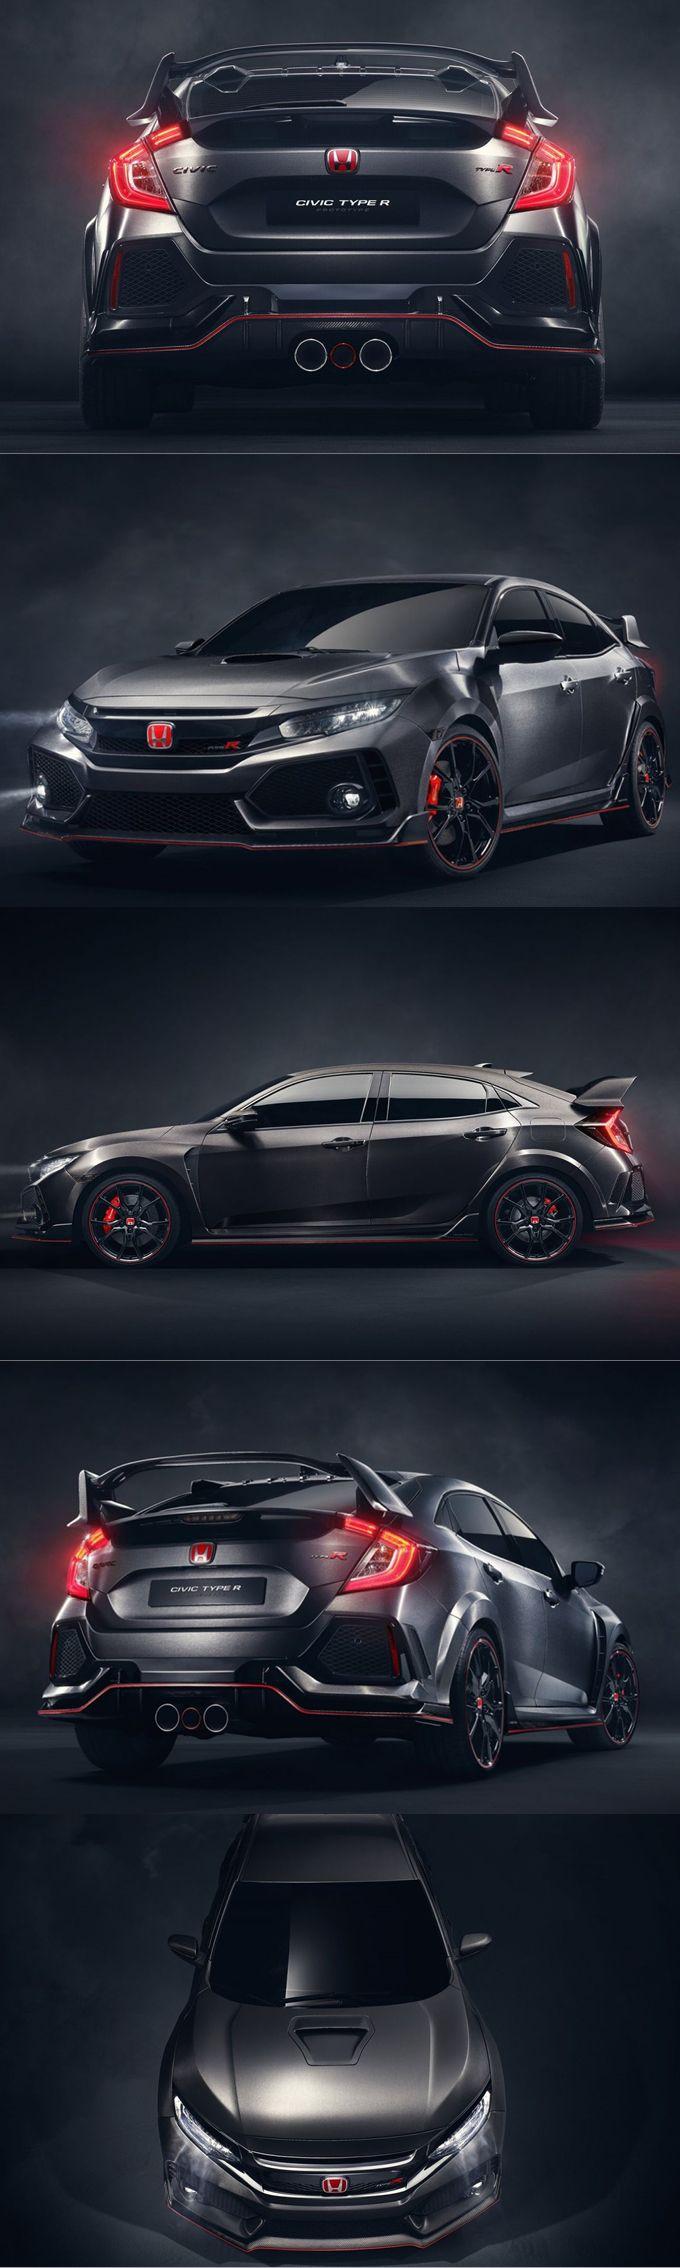 2016 honda civic type r concept japan grey red hot hatch 16